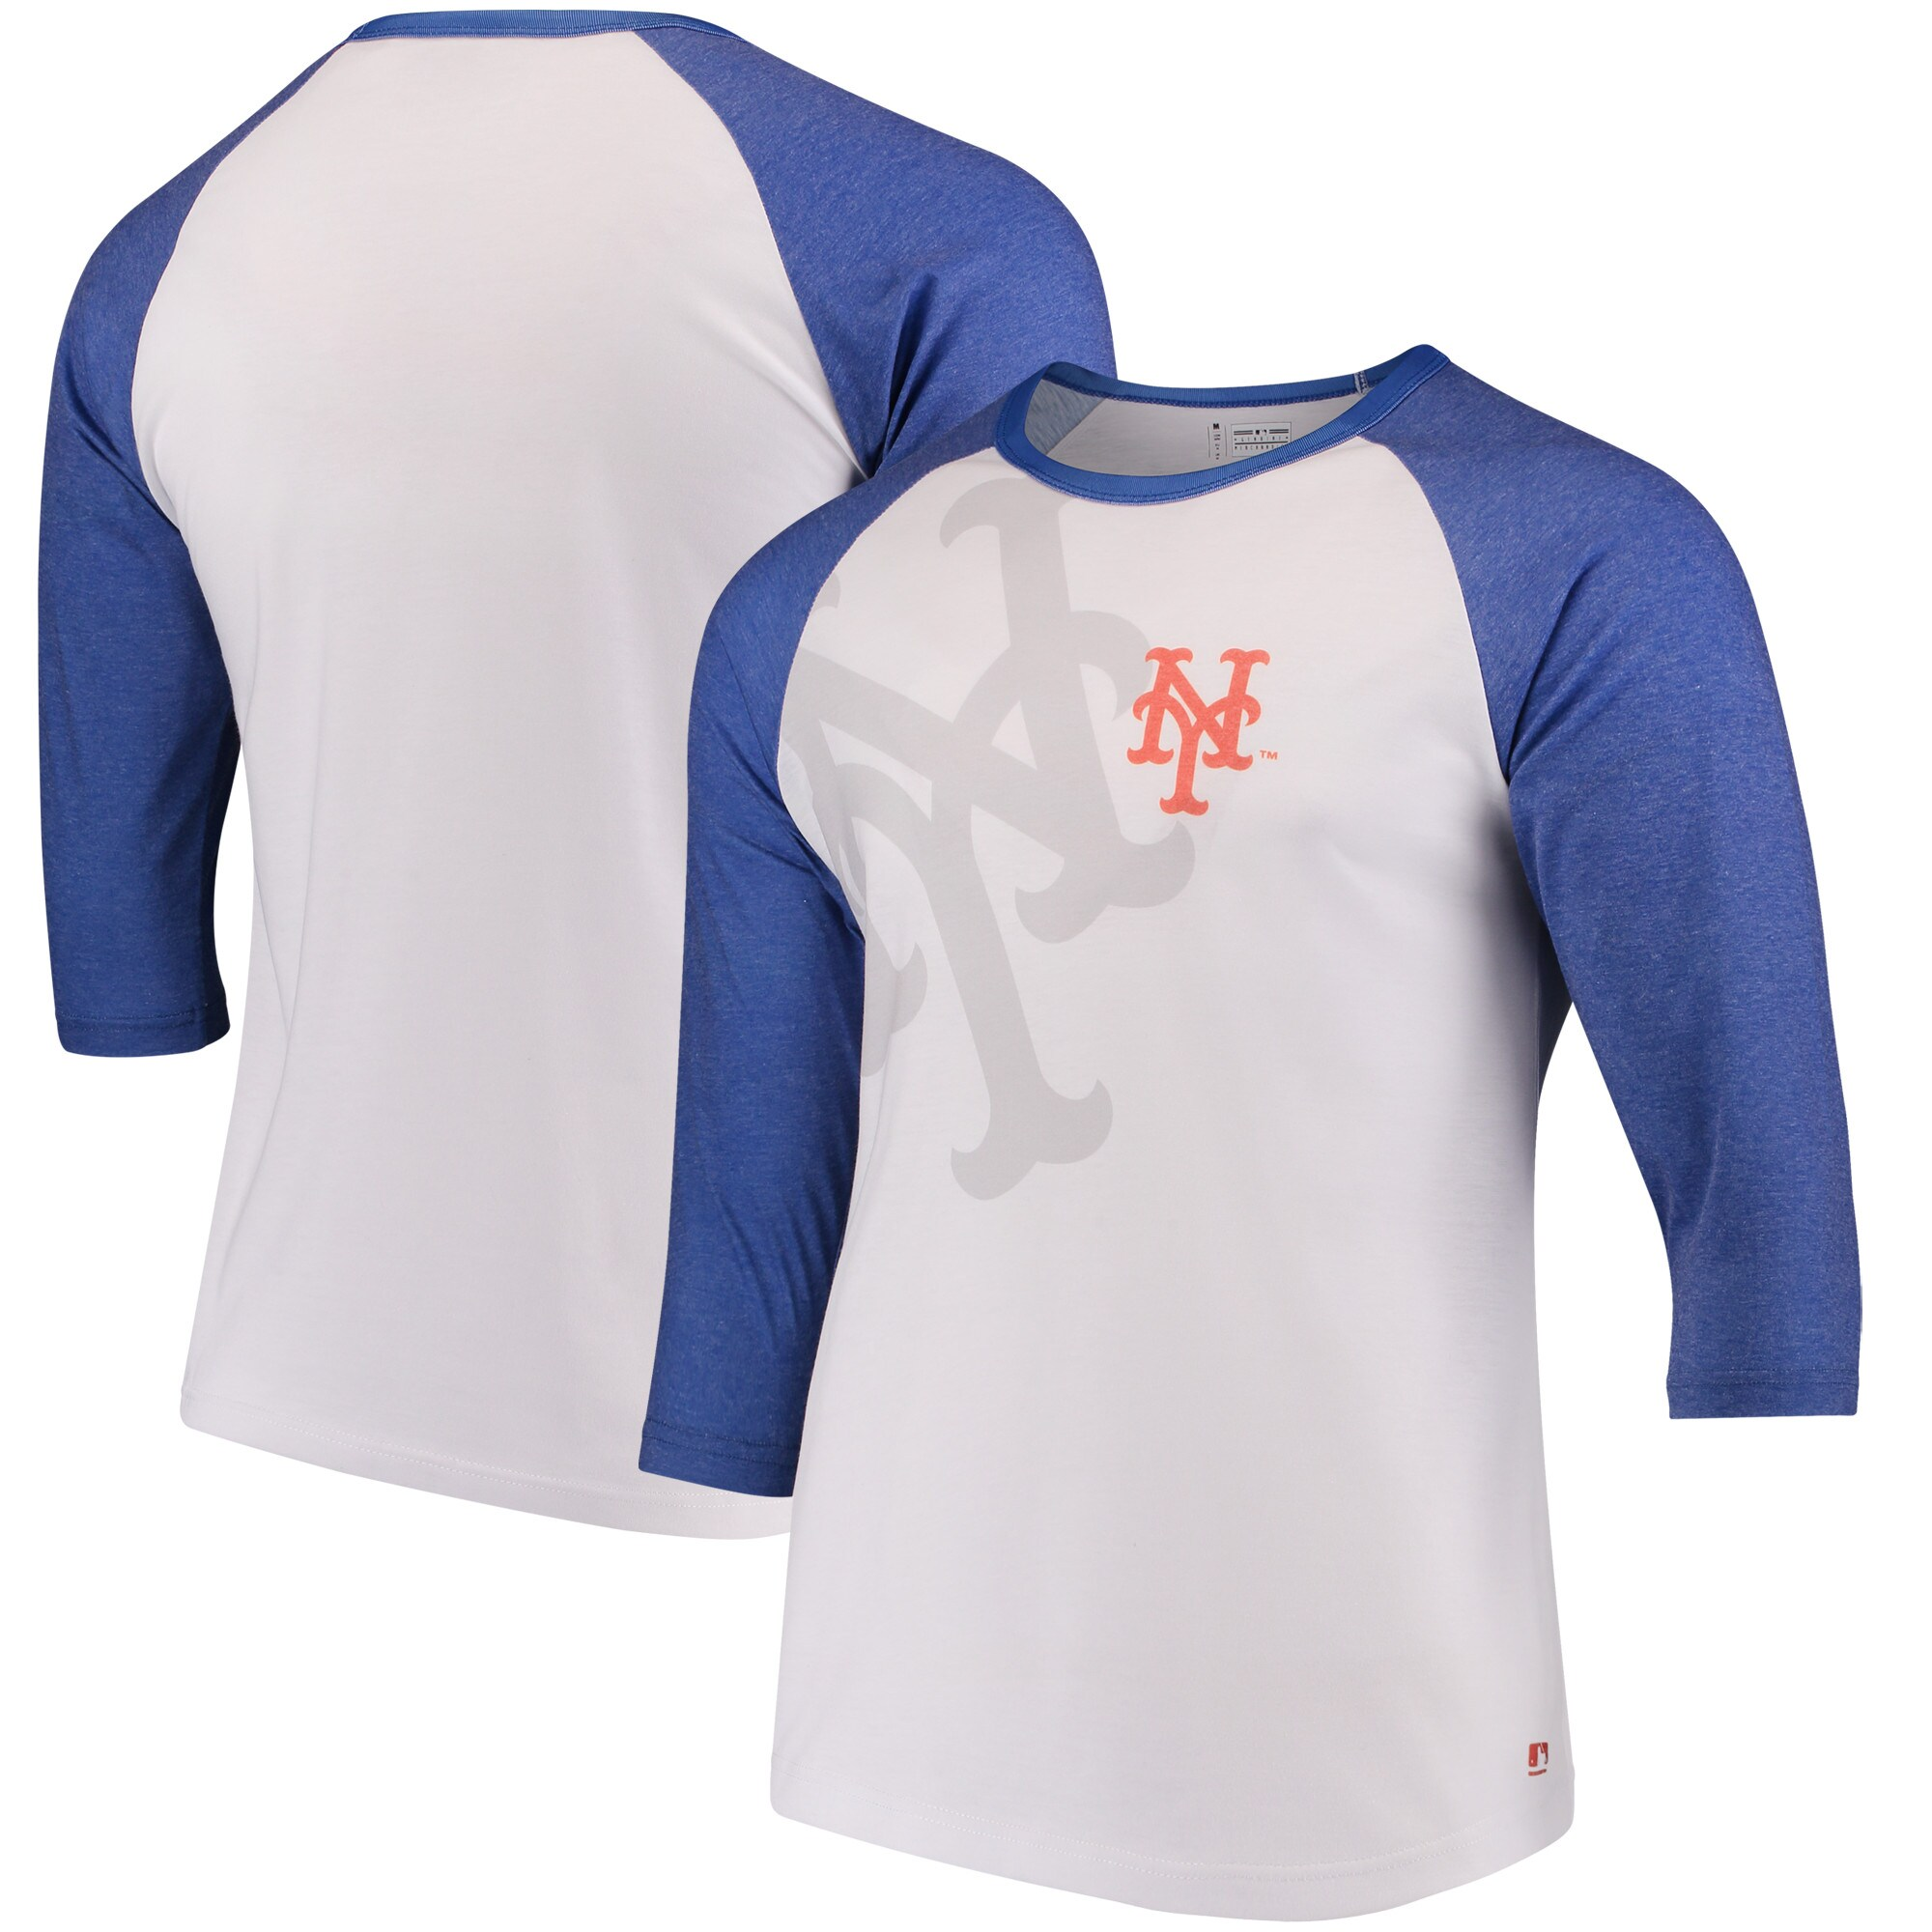 New York Mets Baseball 3/4-Sleeve Raglan T-Shirt - White/Royal